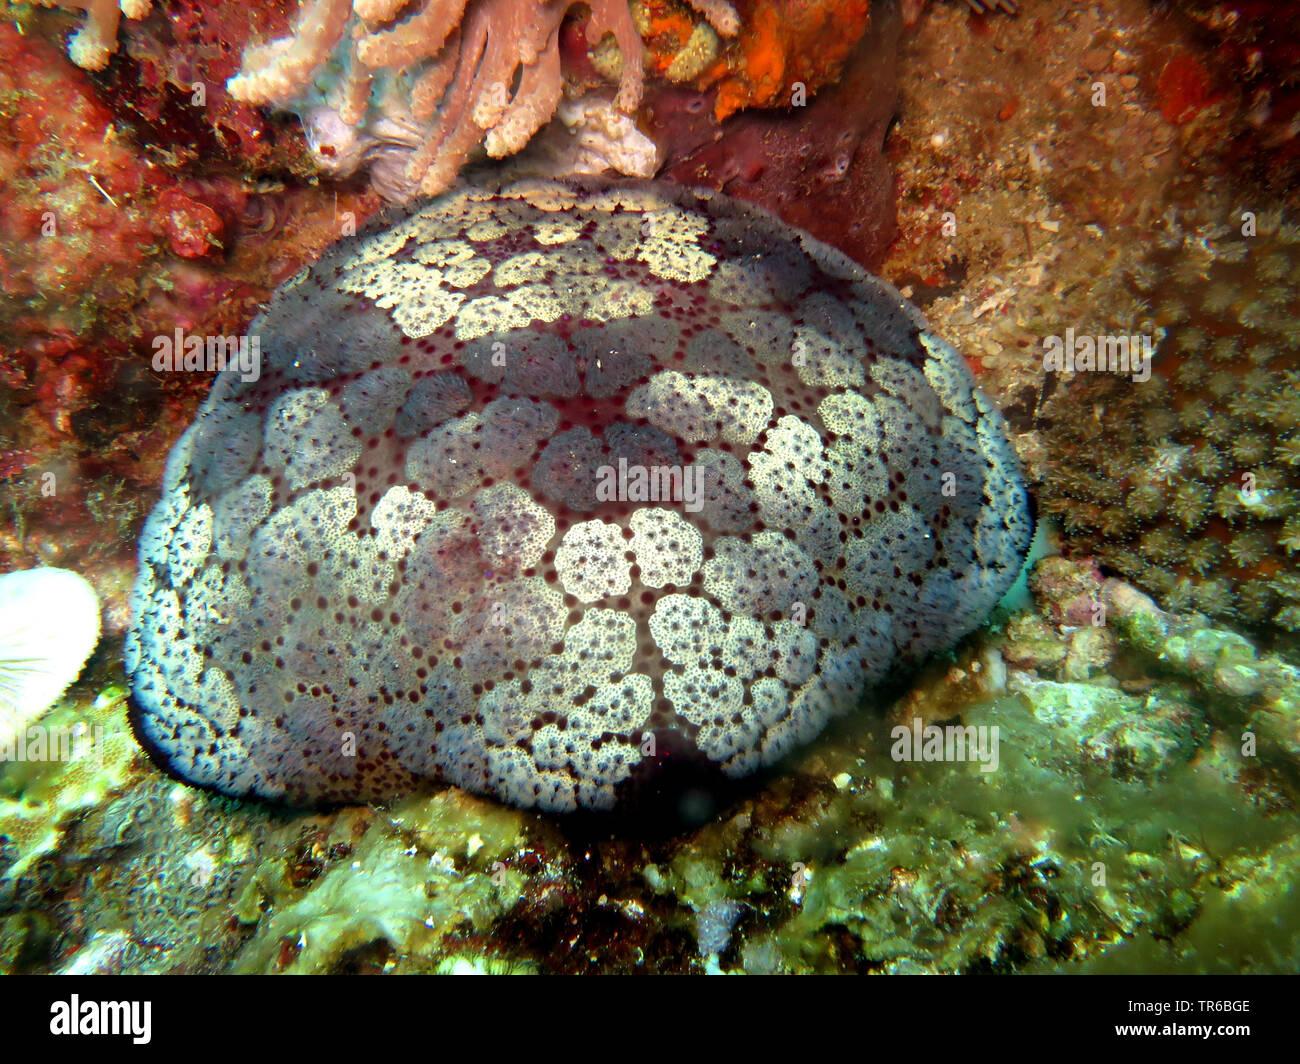 cushion star (Culcita novaeguineae), at the reef, Philippines, Southern Leyte, Panaon Island, Pintuyan - Stock Image